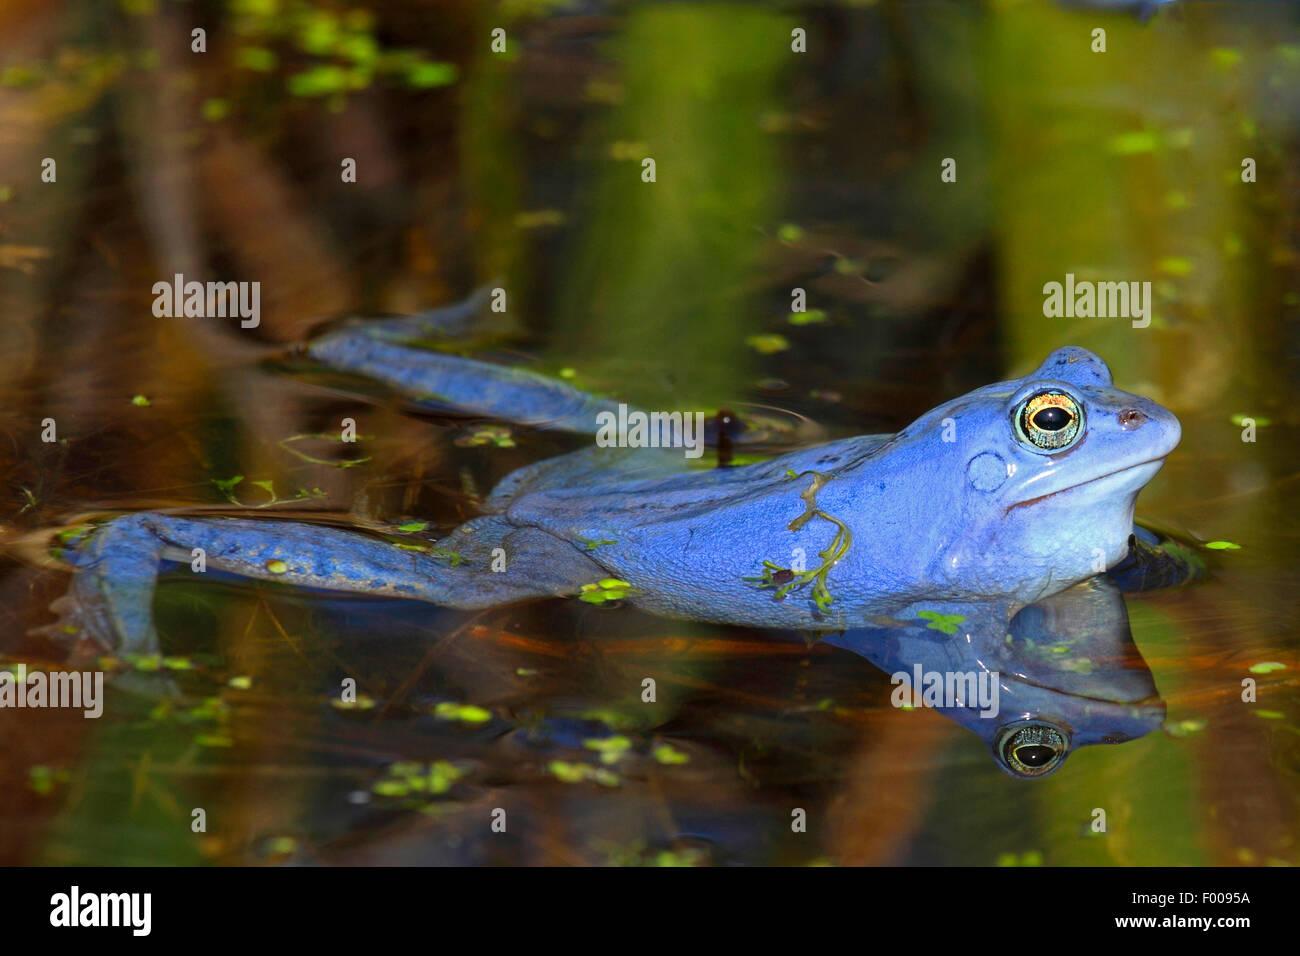 moor frog (Rana arvalis), male in mating season, Germany - Stock Image